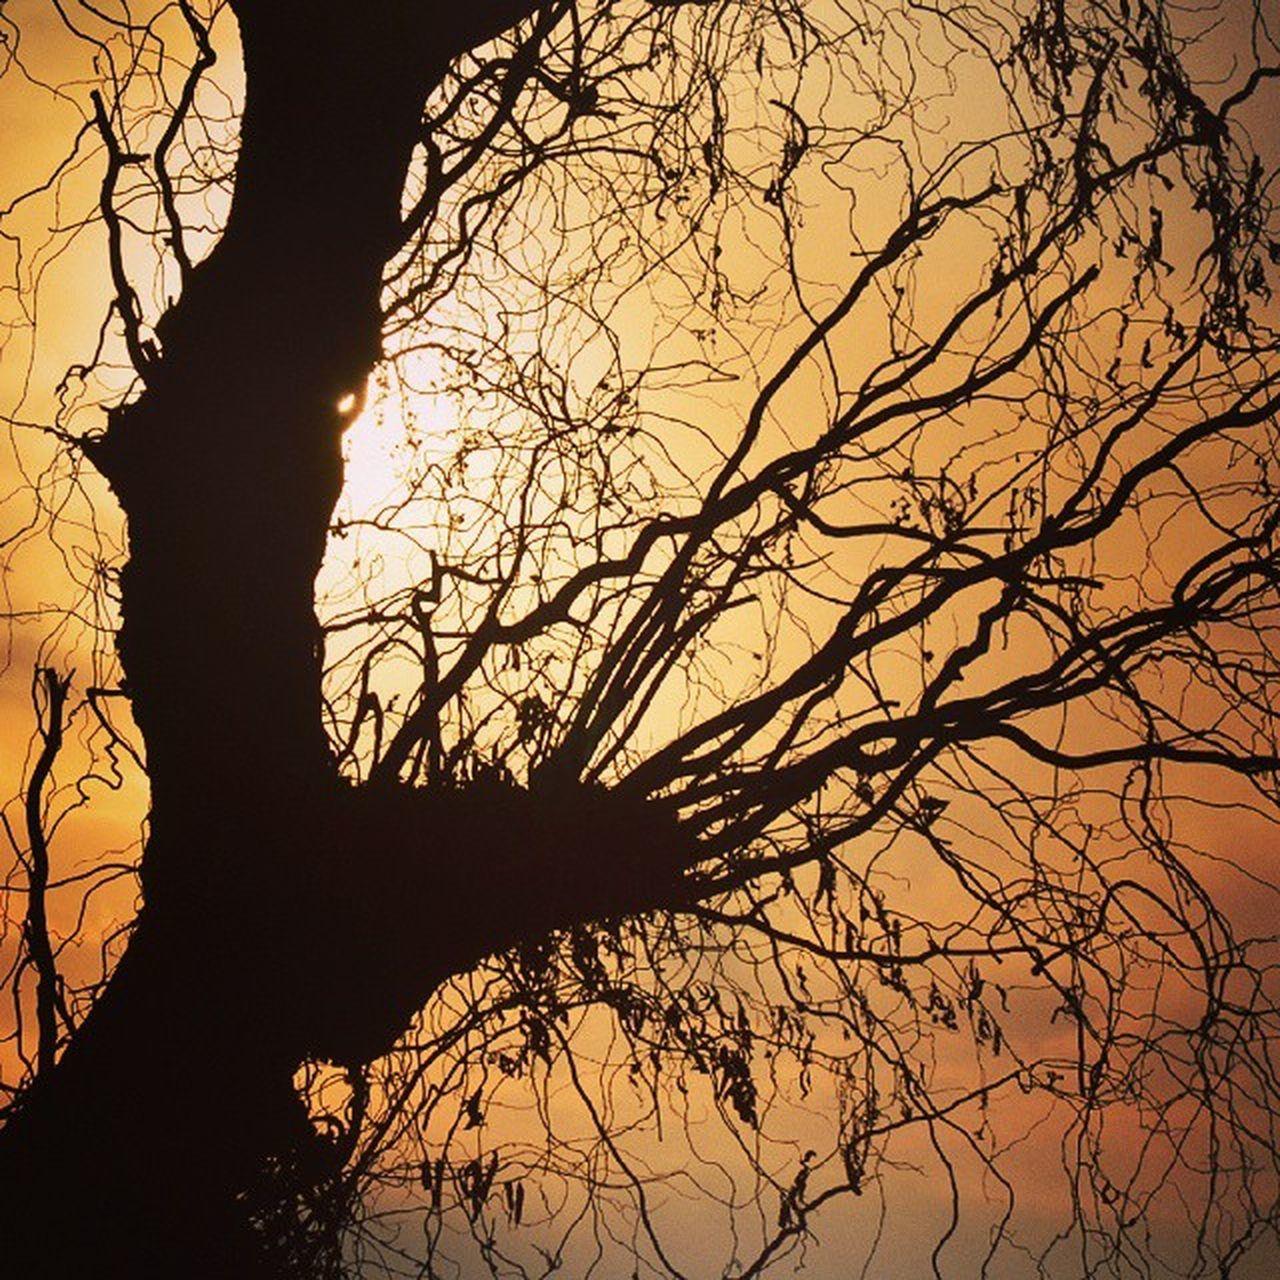 Silhhoutted Tree Branches Sun Silhouette Color Mayfair Evening Sunset Kasheer Kashmir Iphotograph Iamnikon IExploreMe IExploreKashmir IExplore IAmKashmir Itravel ITread Explore ExploringUnknown Revoshotsphotography Revoshots Revo RevoTheRebel